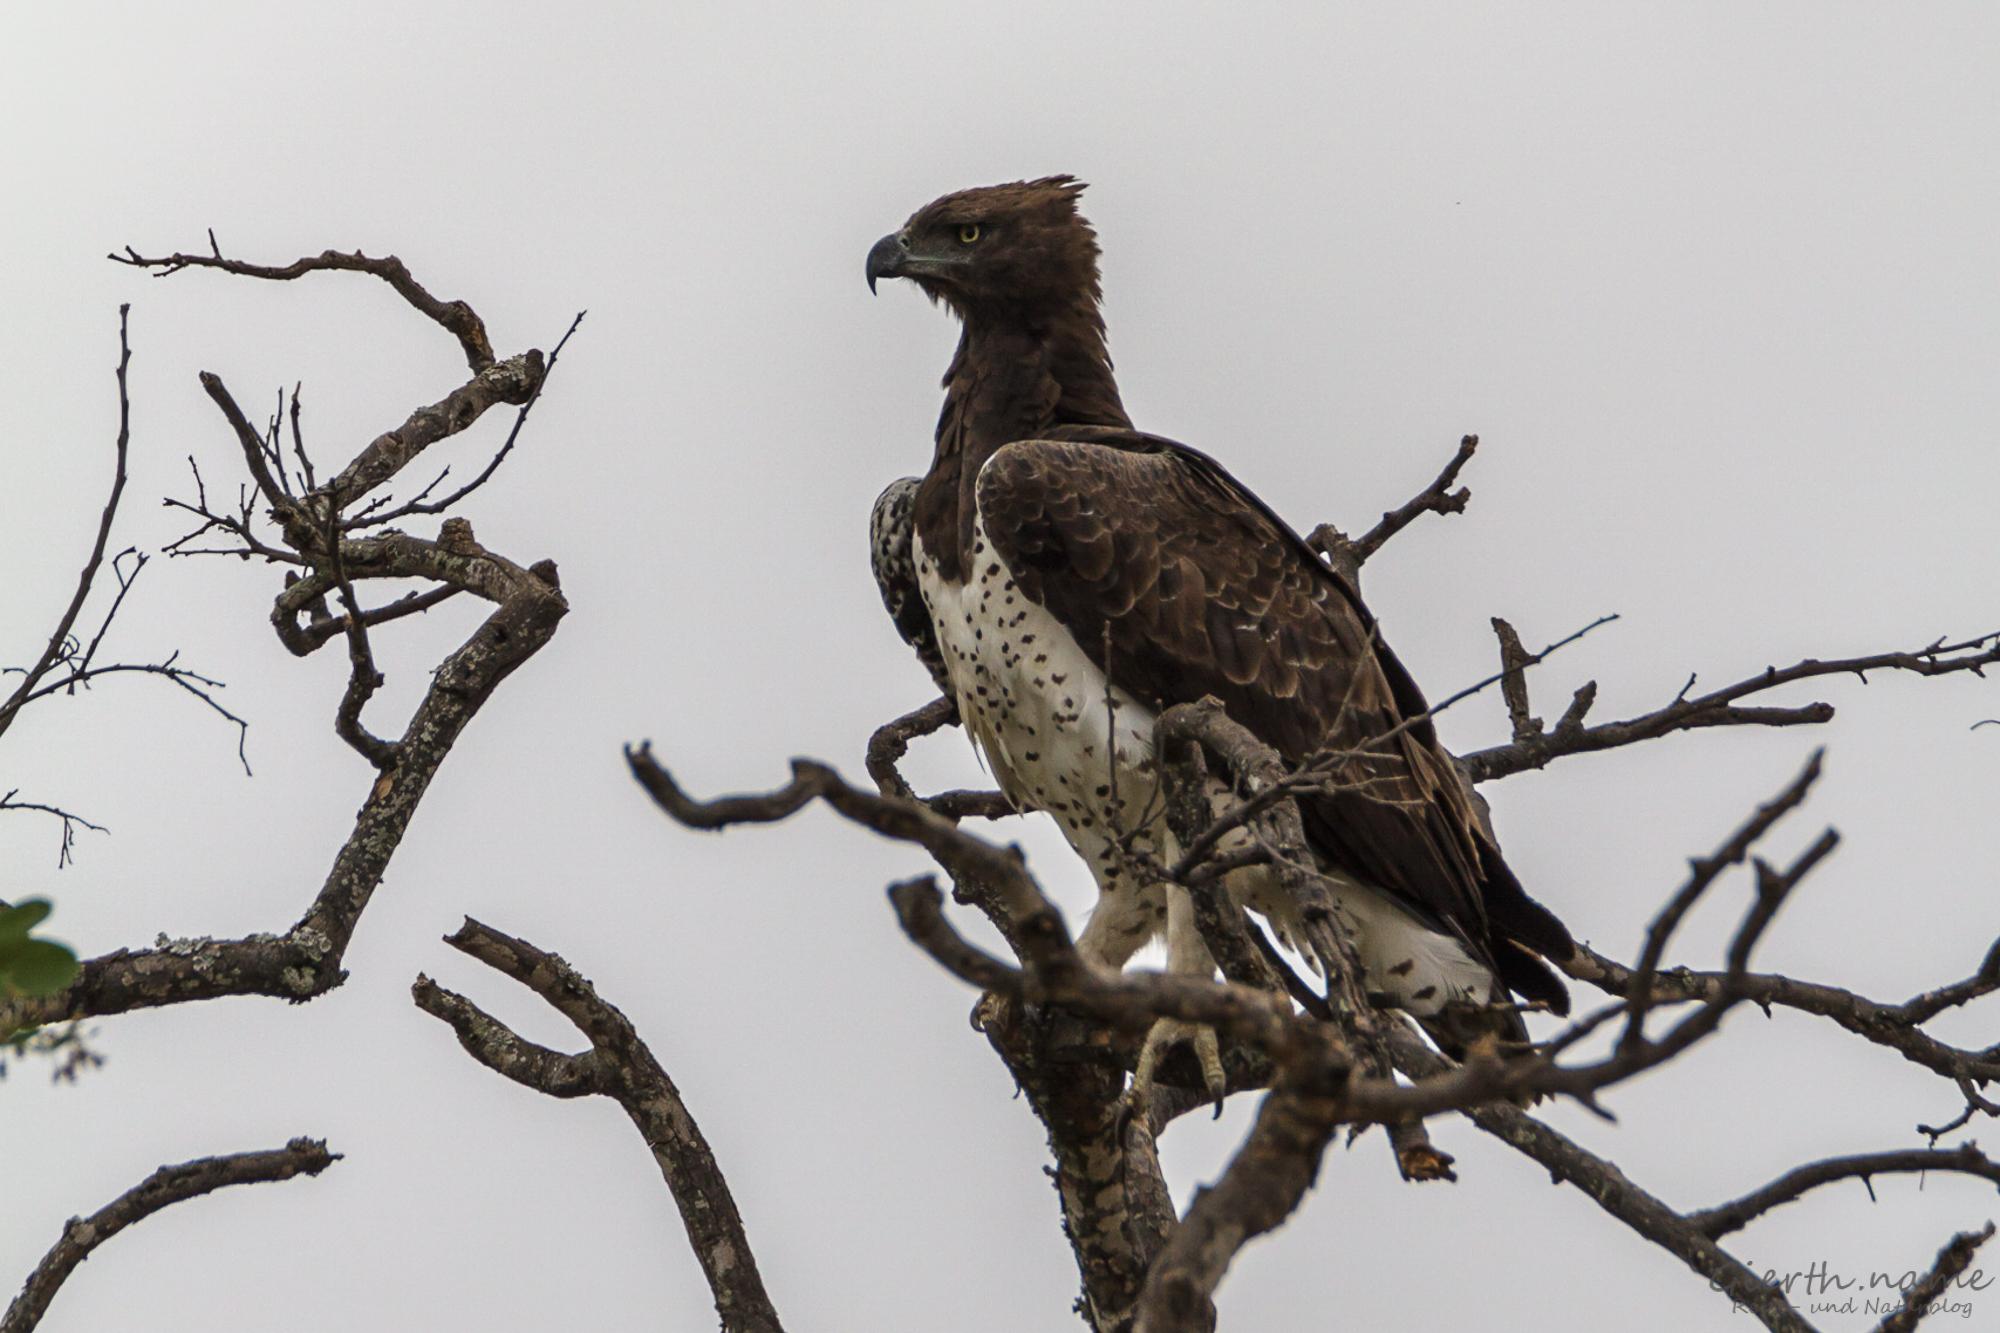 Kampfadler - Martial eagle - Polemaetus bellicosus